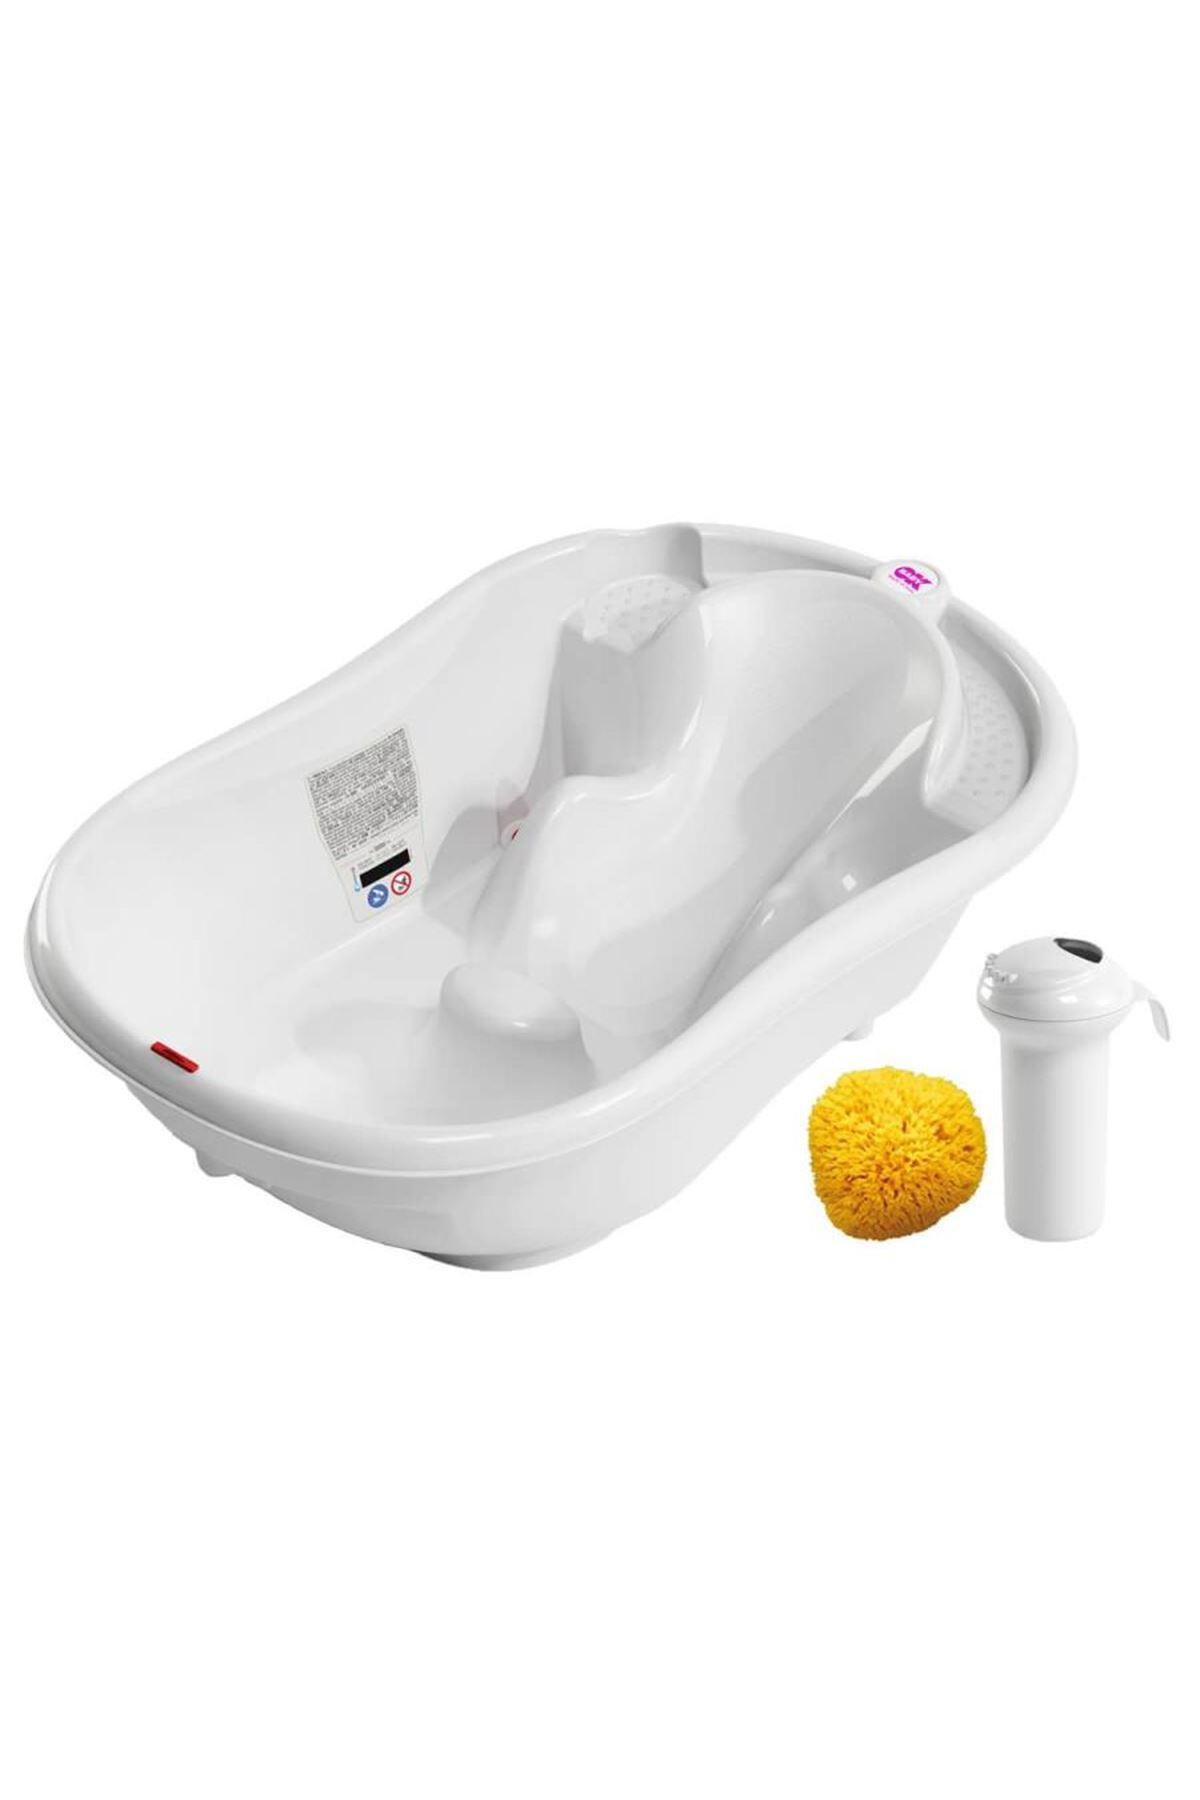 OkBaby Onda Evol Banyo Küveti & Splash Bebek Duşu & Doğal Banyo Süngeri No.10 / Beyaz